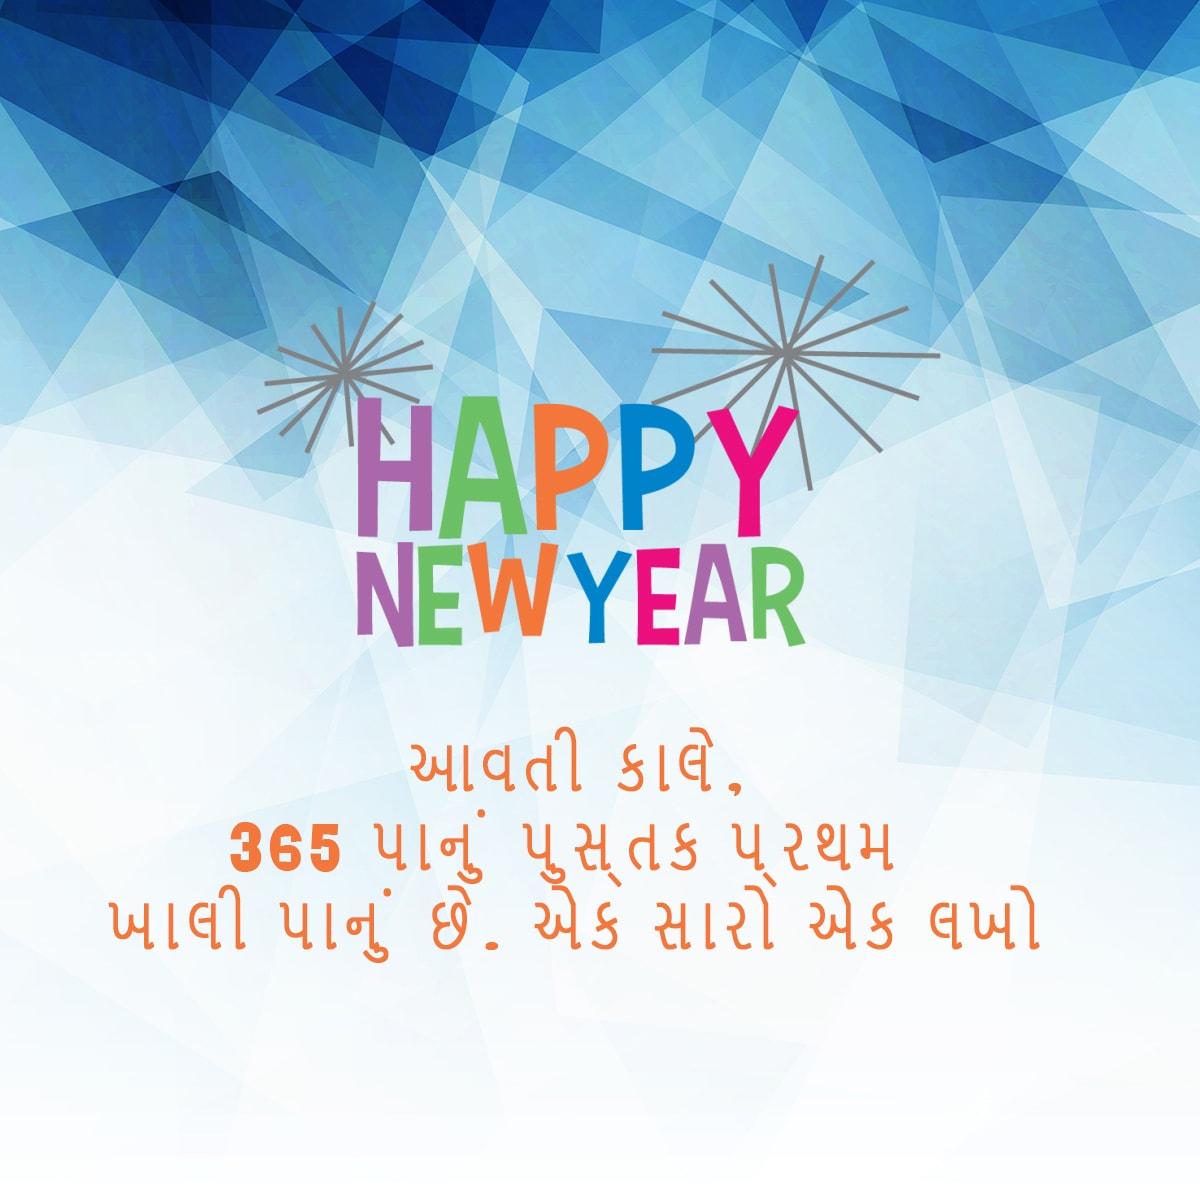 Happy New Year 2018 Wishes in Gujarati for Whatsapp